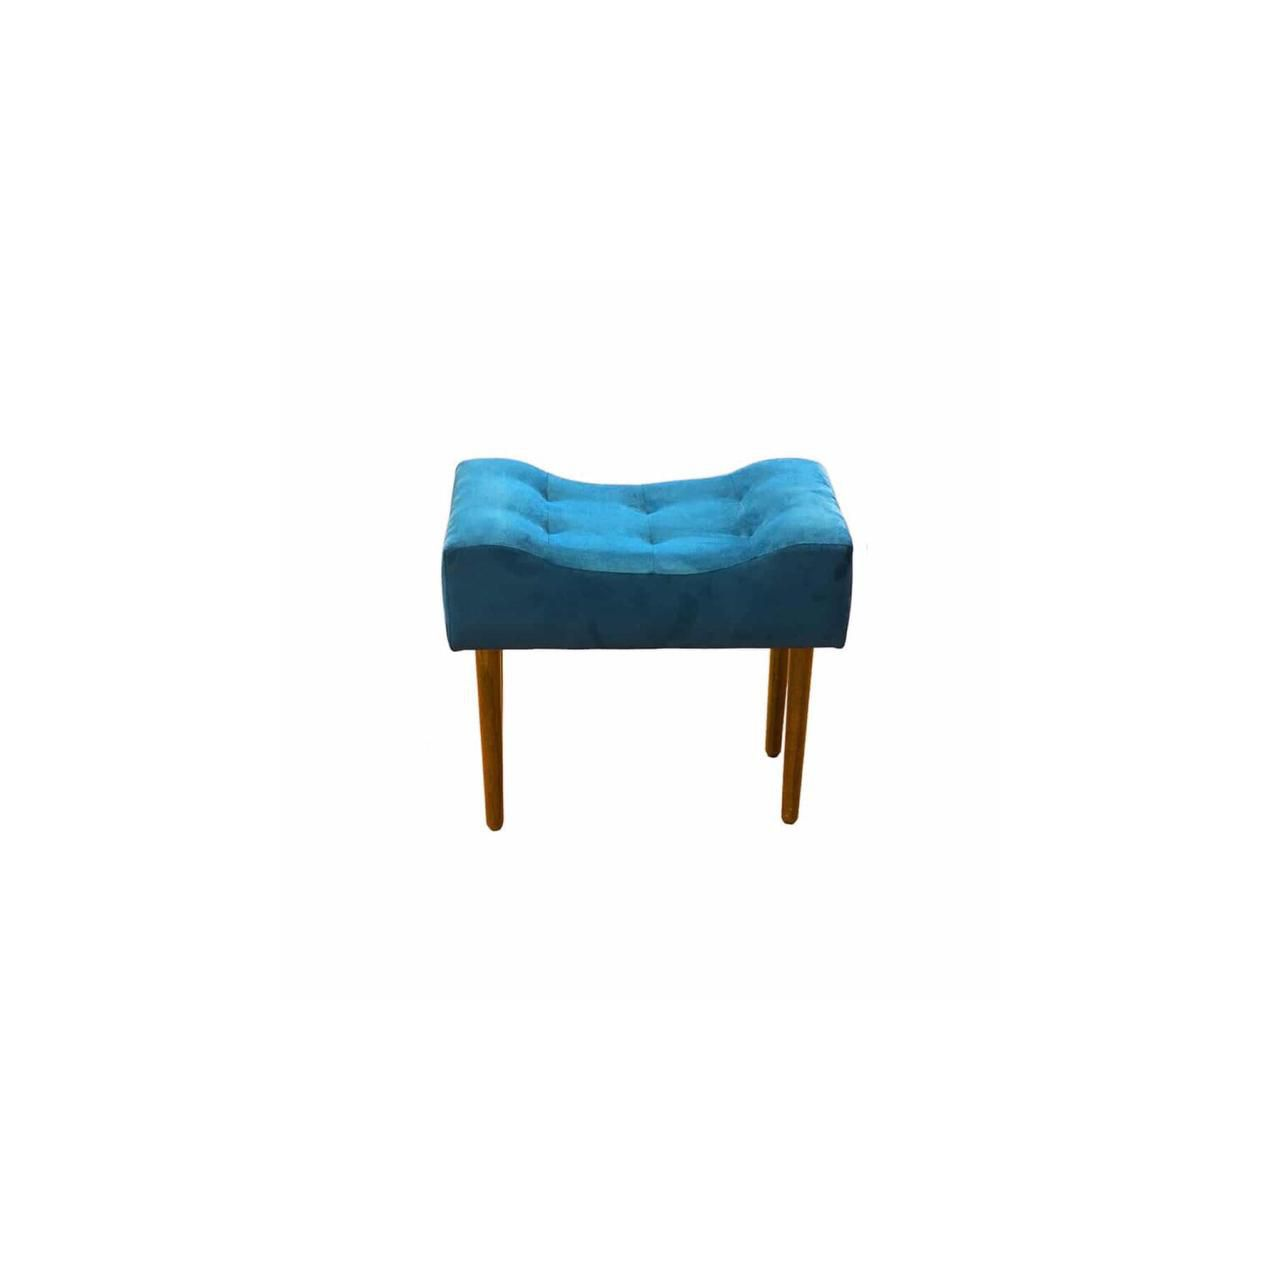 Kit 02 Poltrona Decorativa Nina com rodapé e Puff retangular Azul - Bela Casa Shop